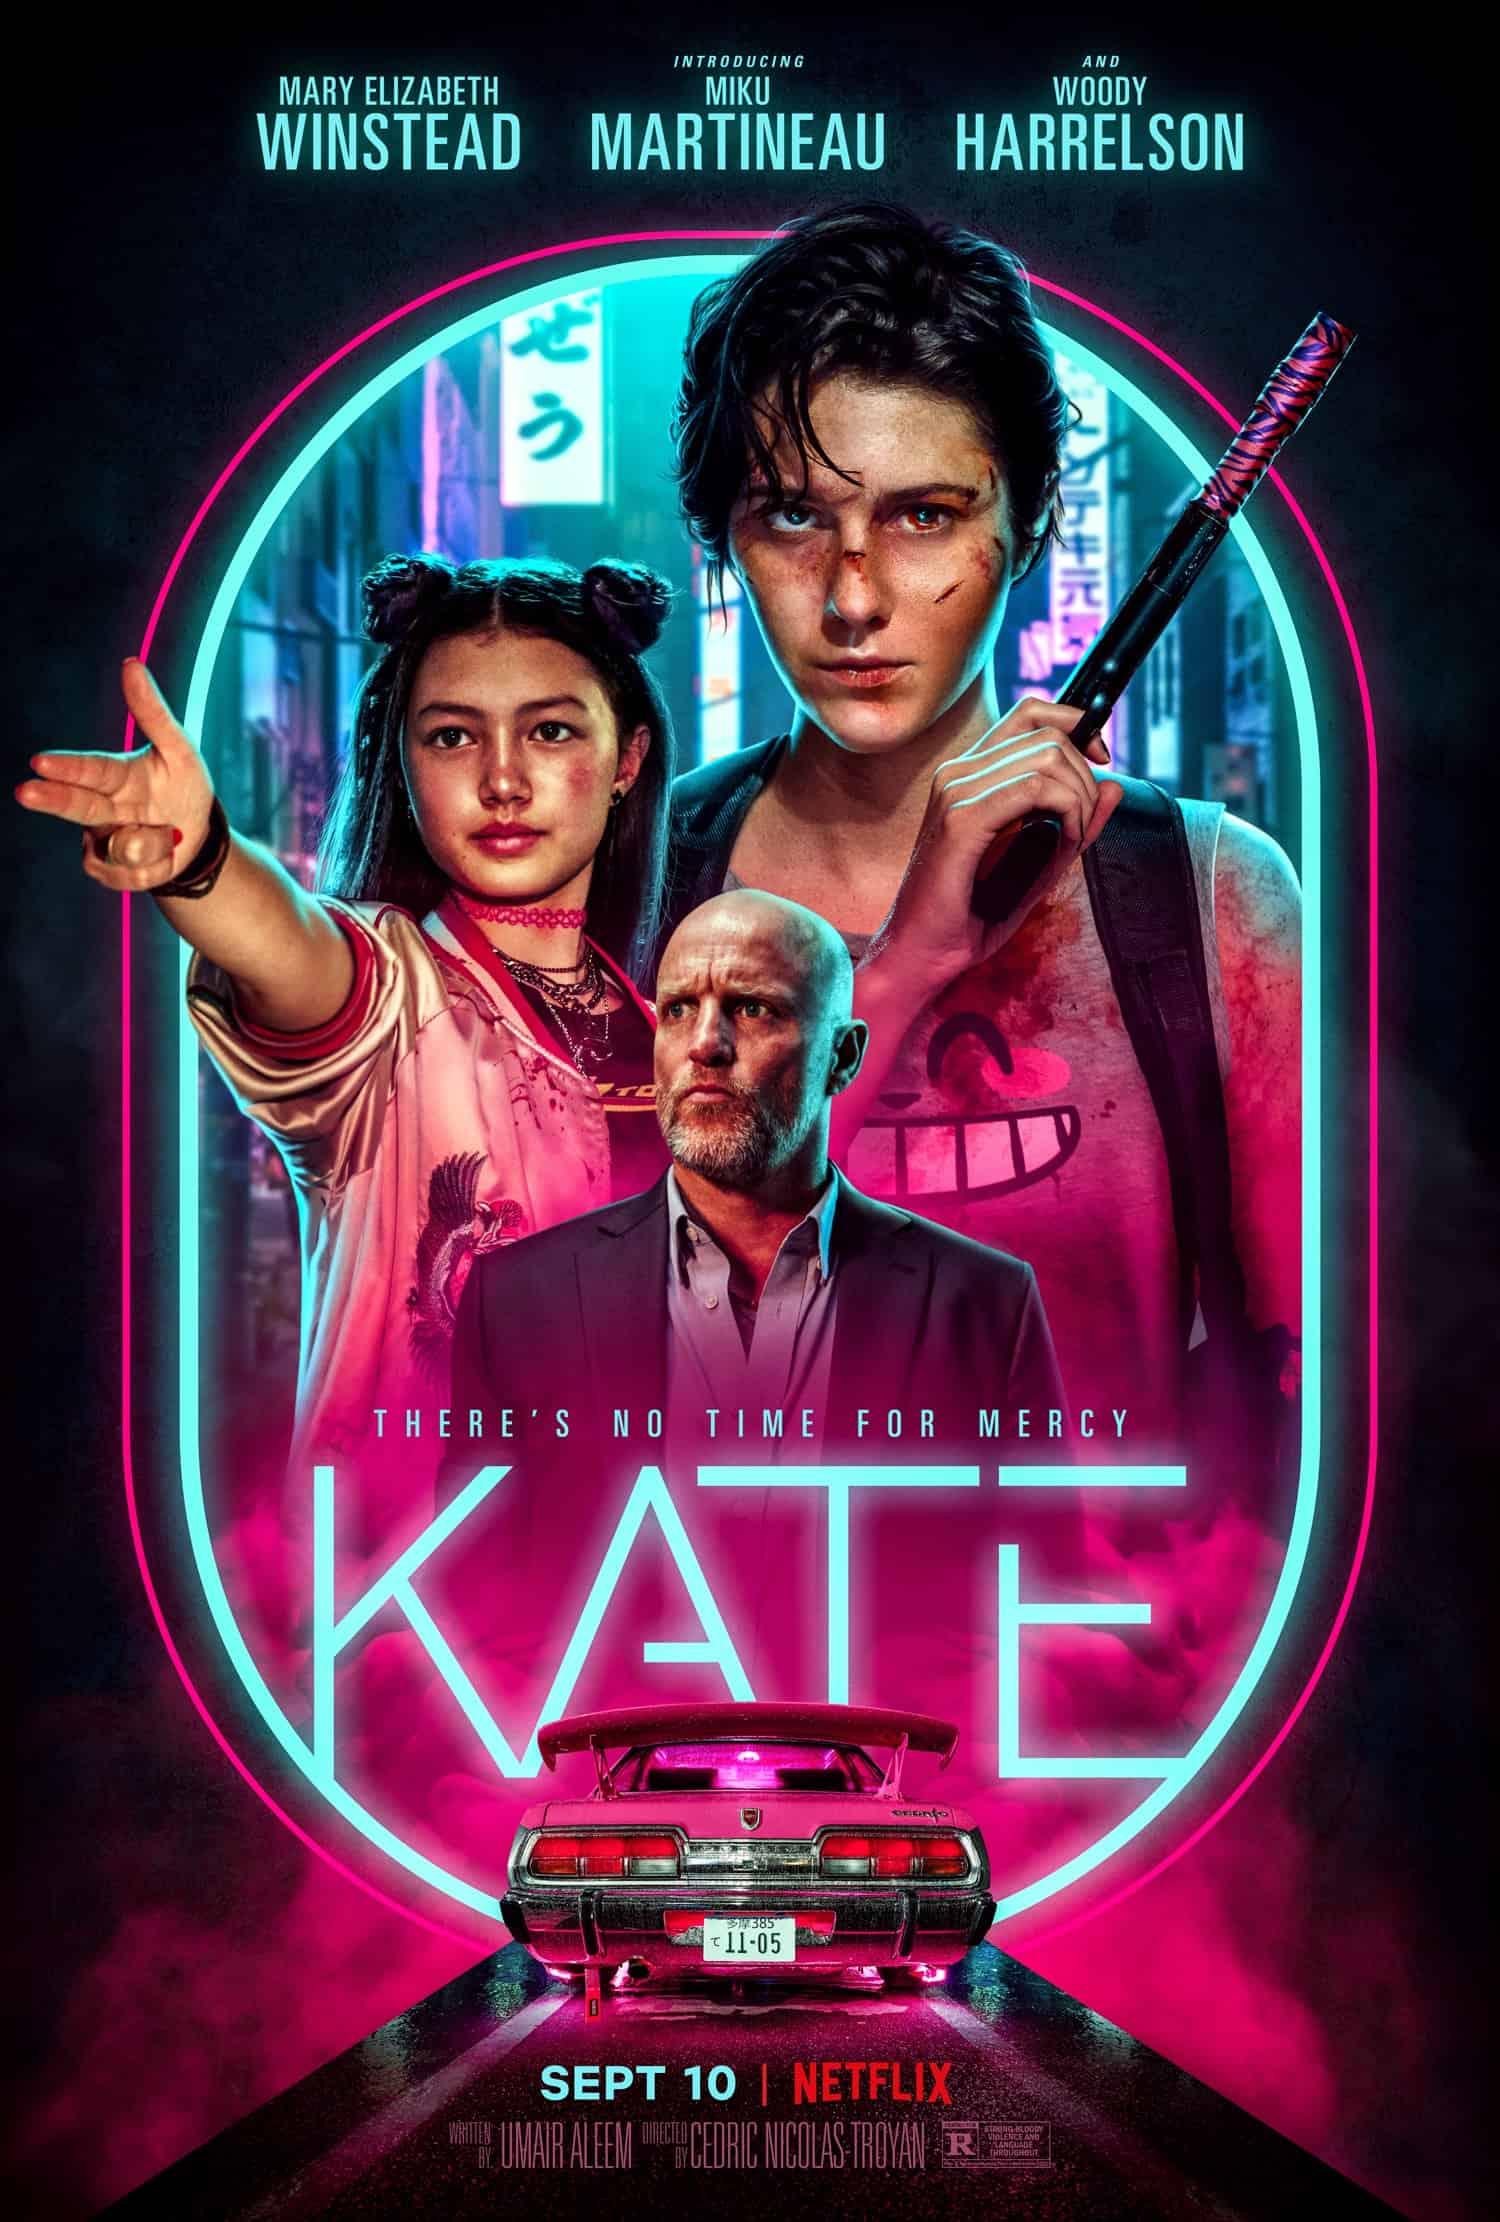 Movie Poster - Kate (2021)